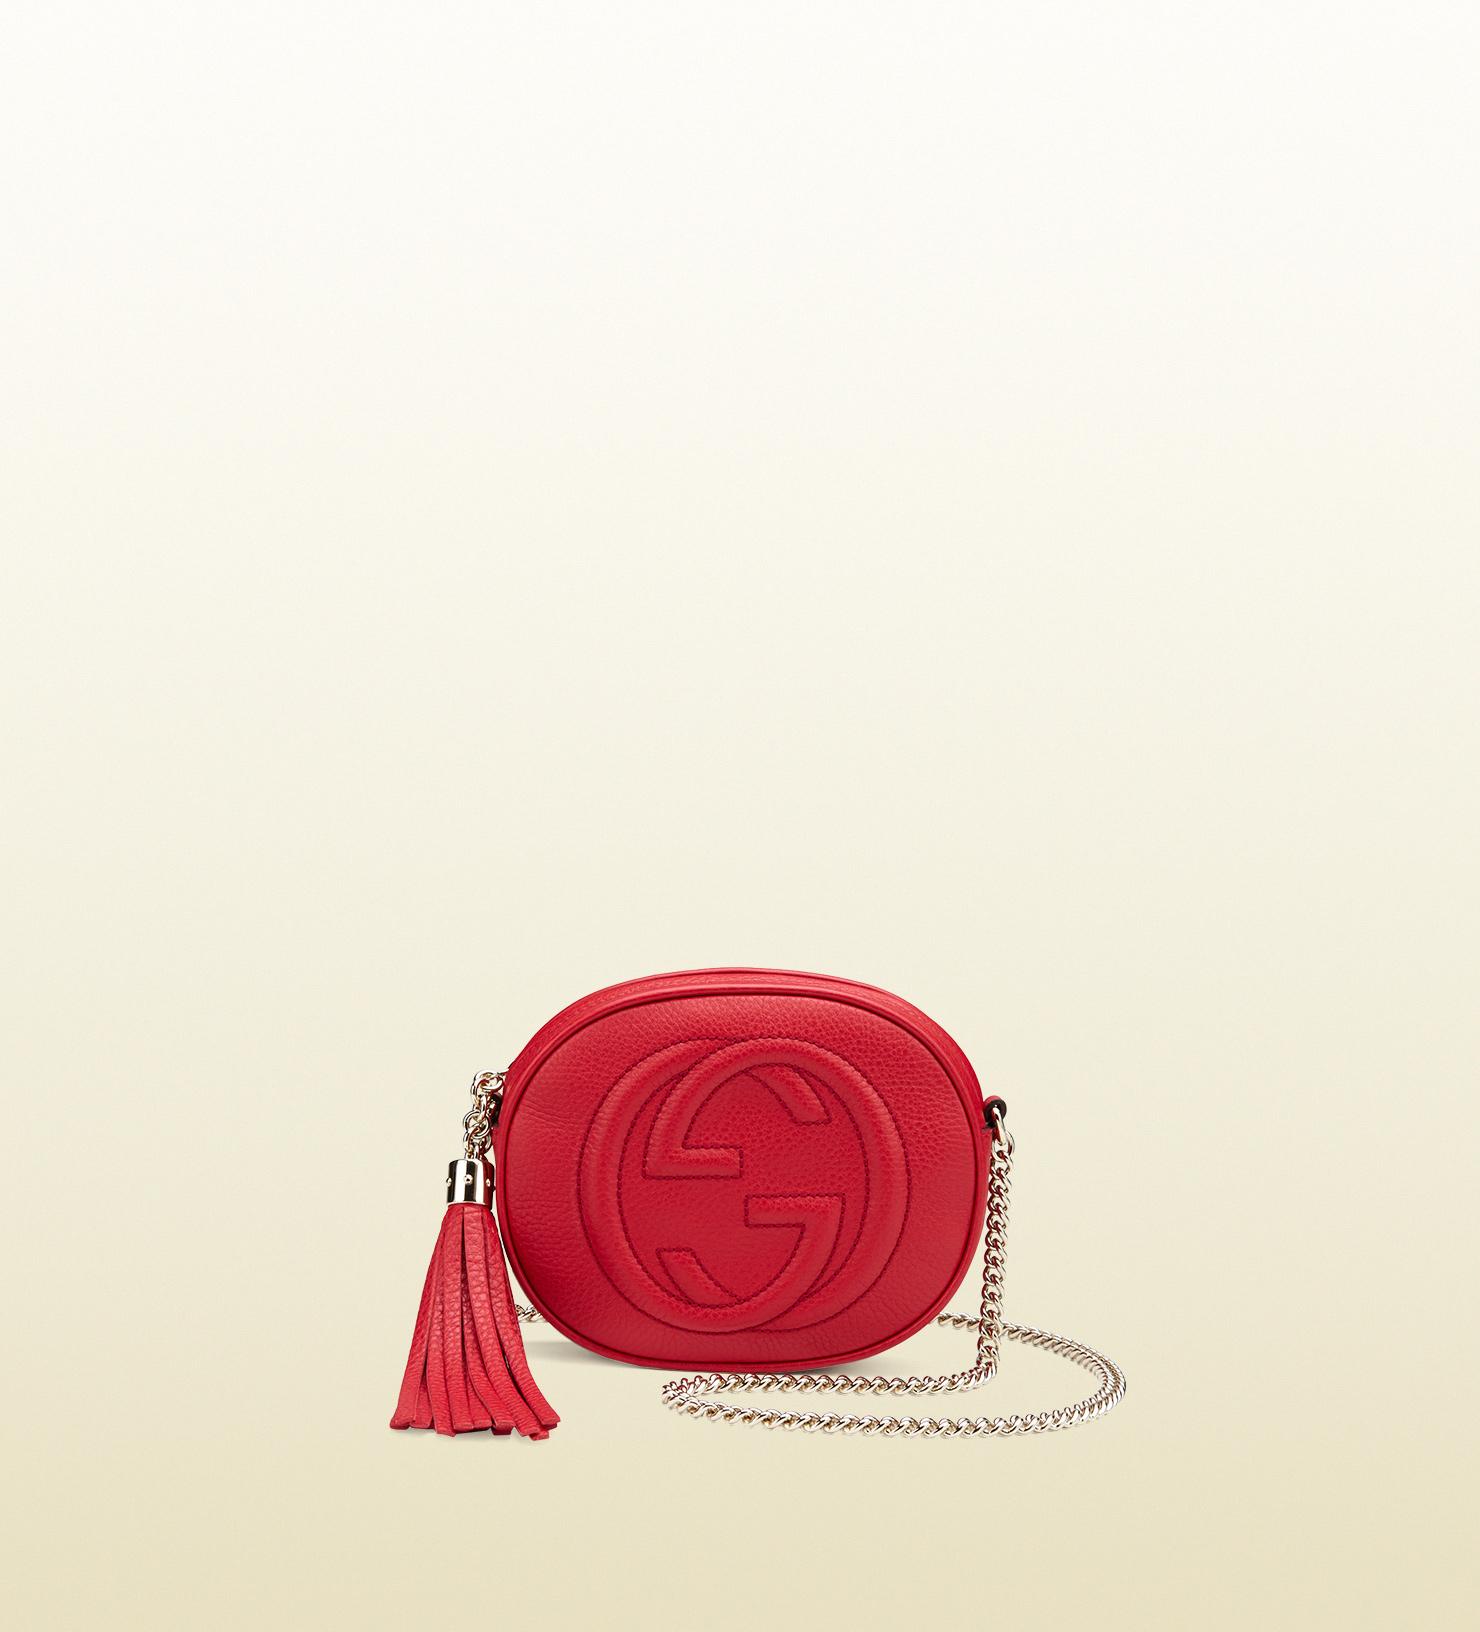 Gucci - soho leather mini chain bag 353965A7M0G6523